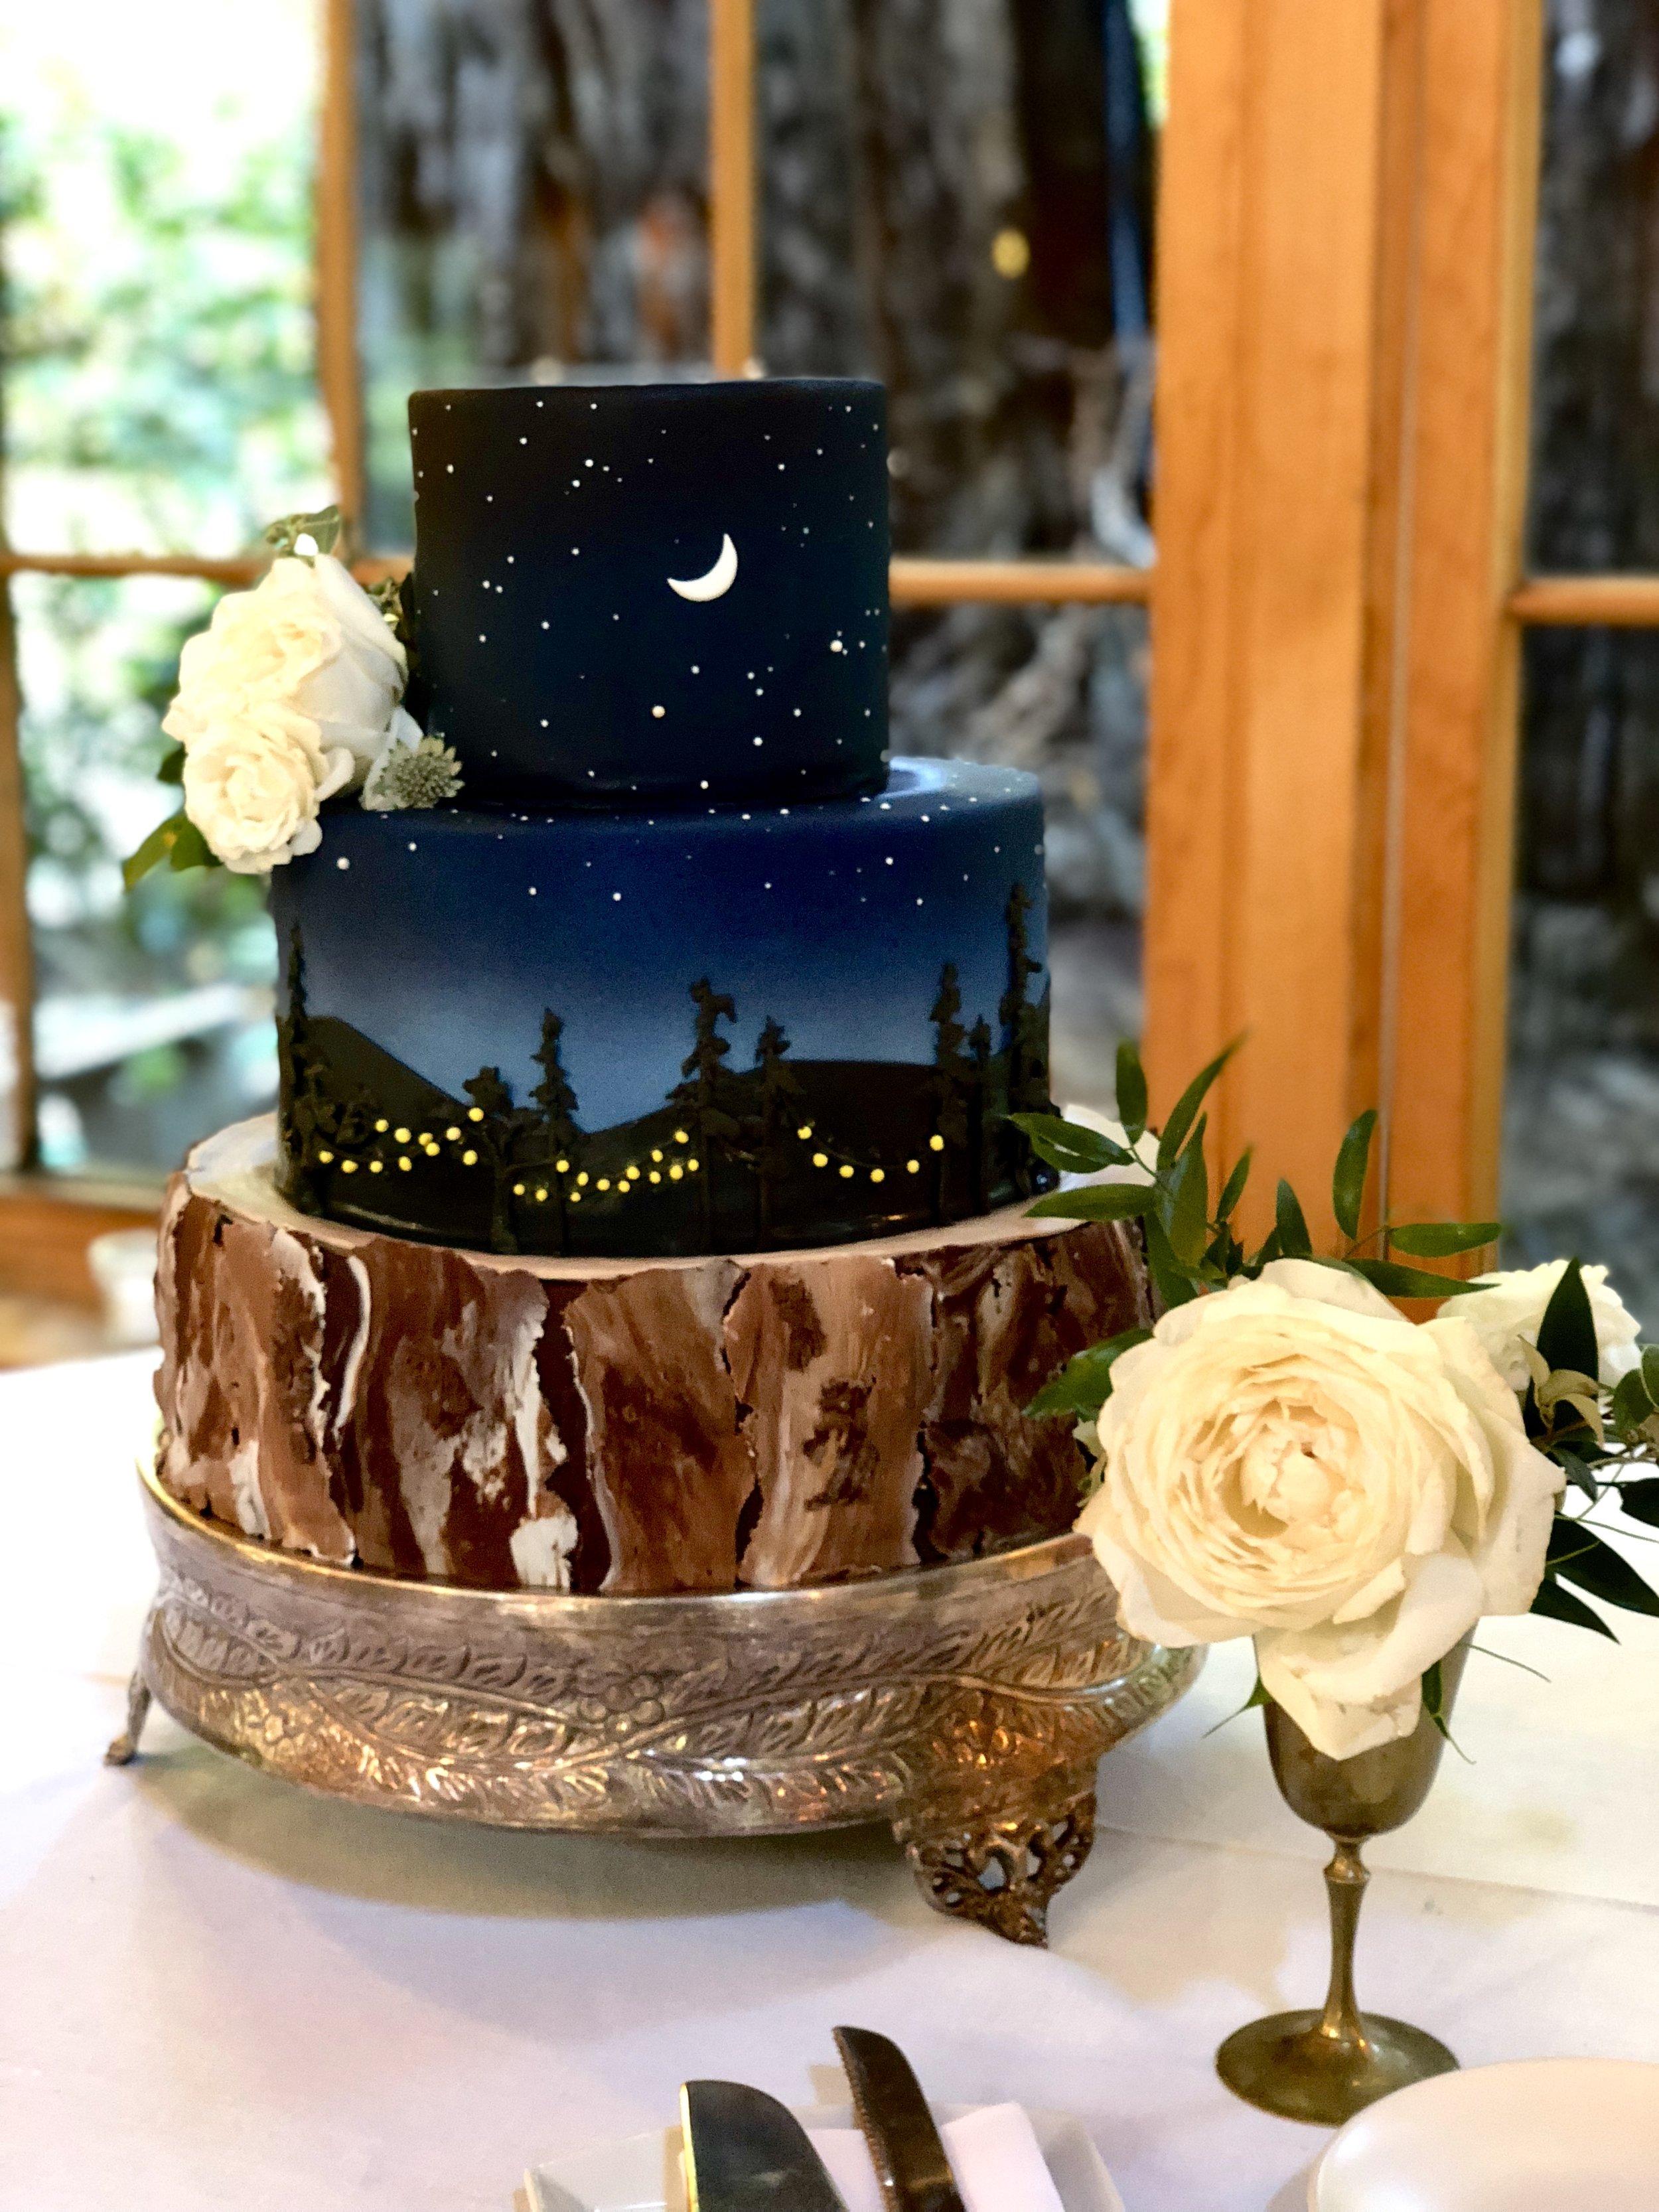 Wedding Cake at Nestldown - 2018 July.jpg